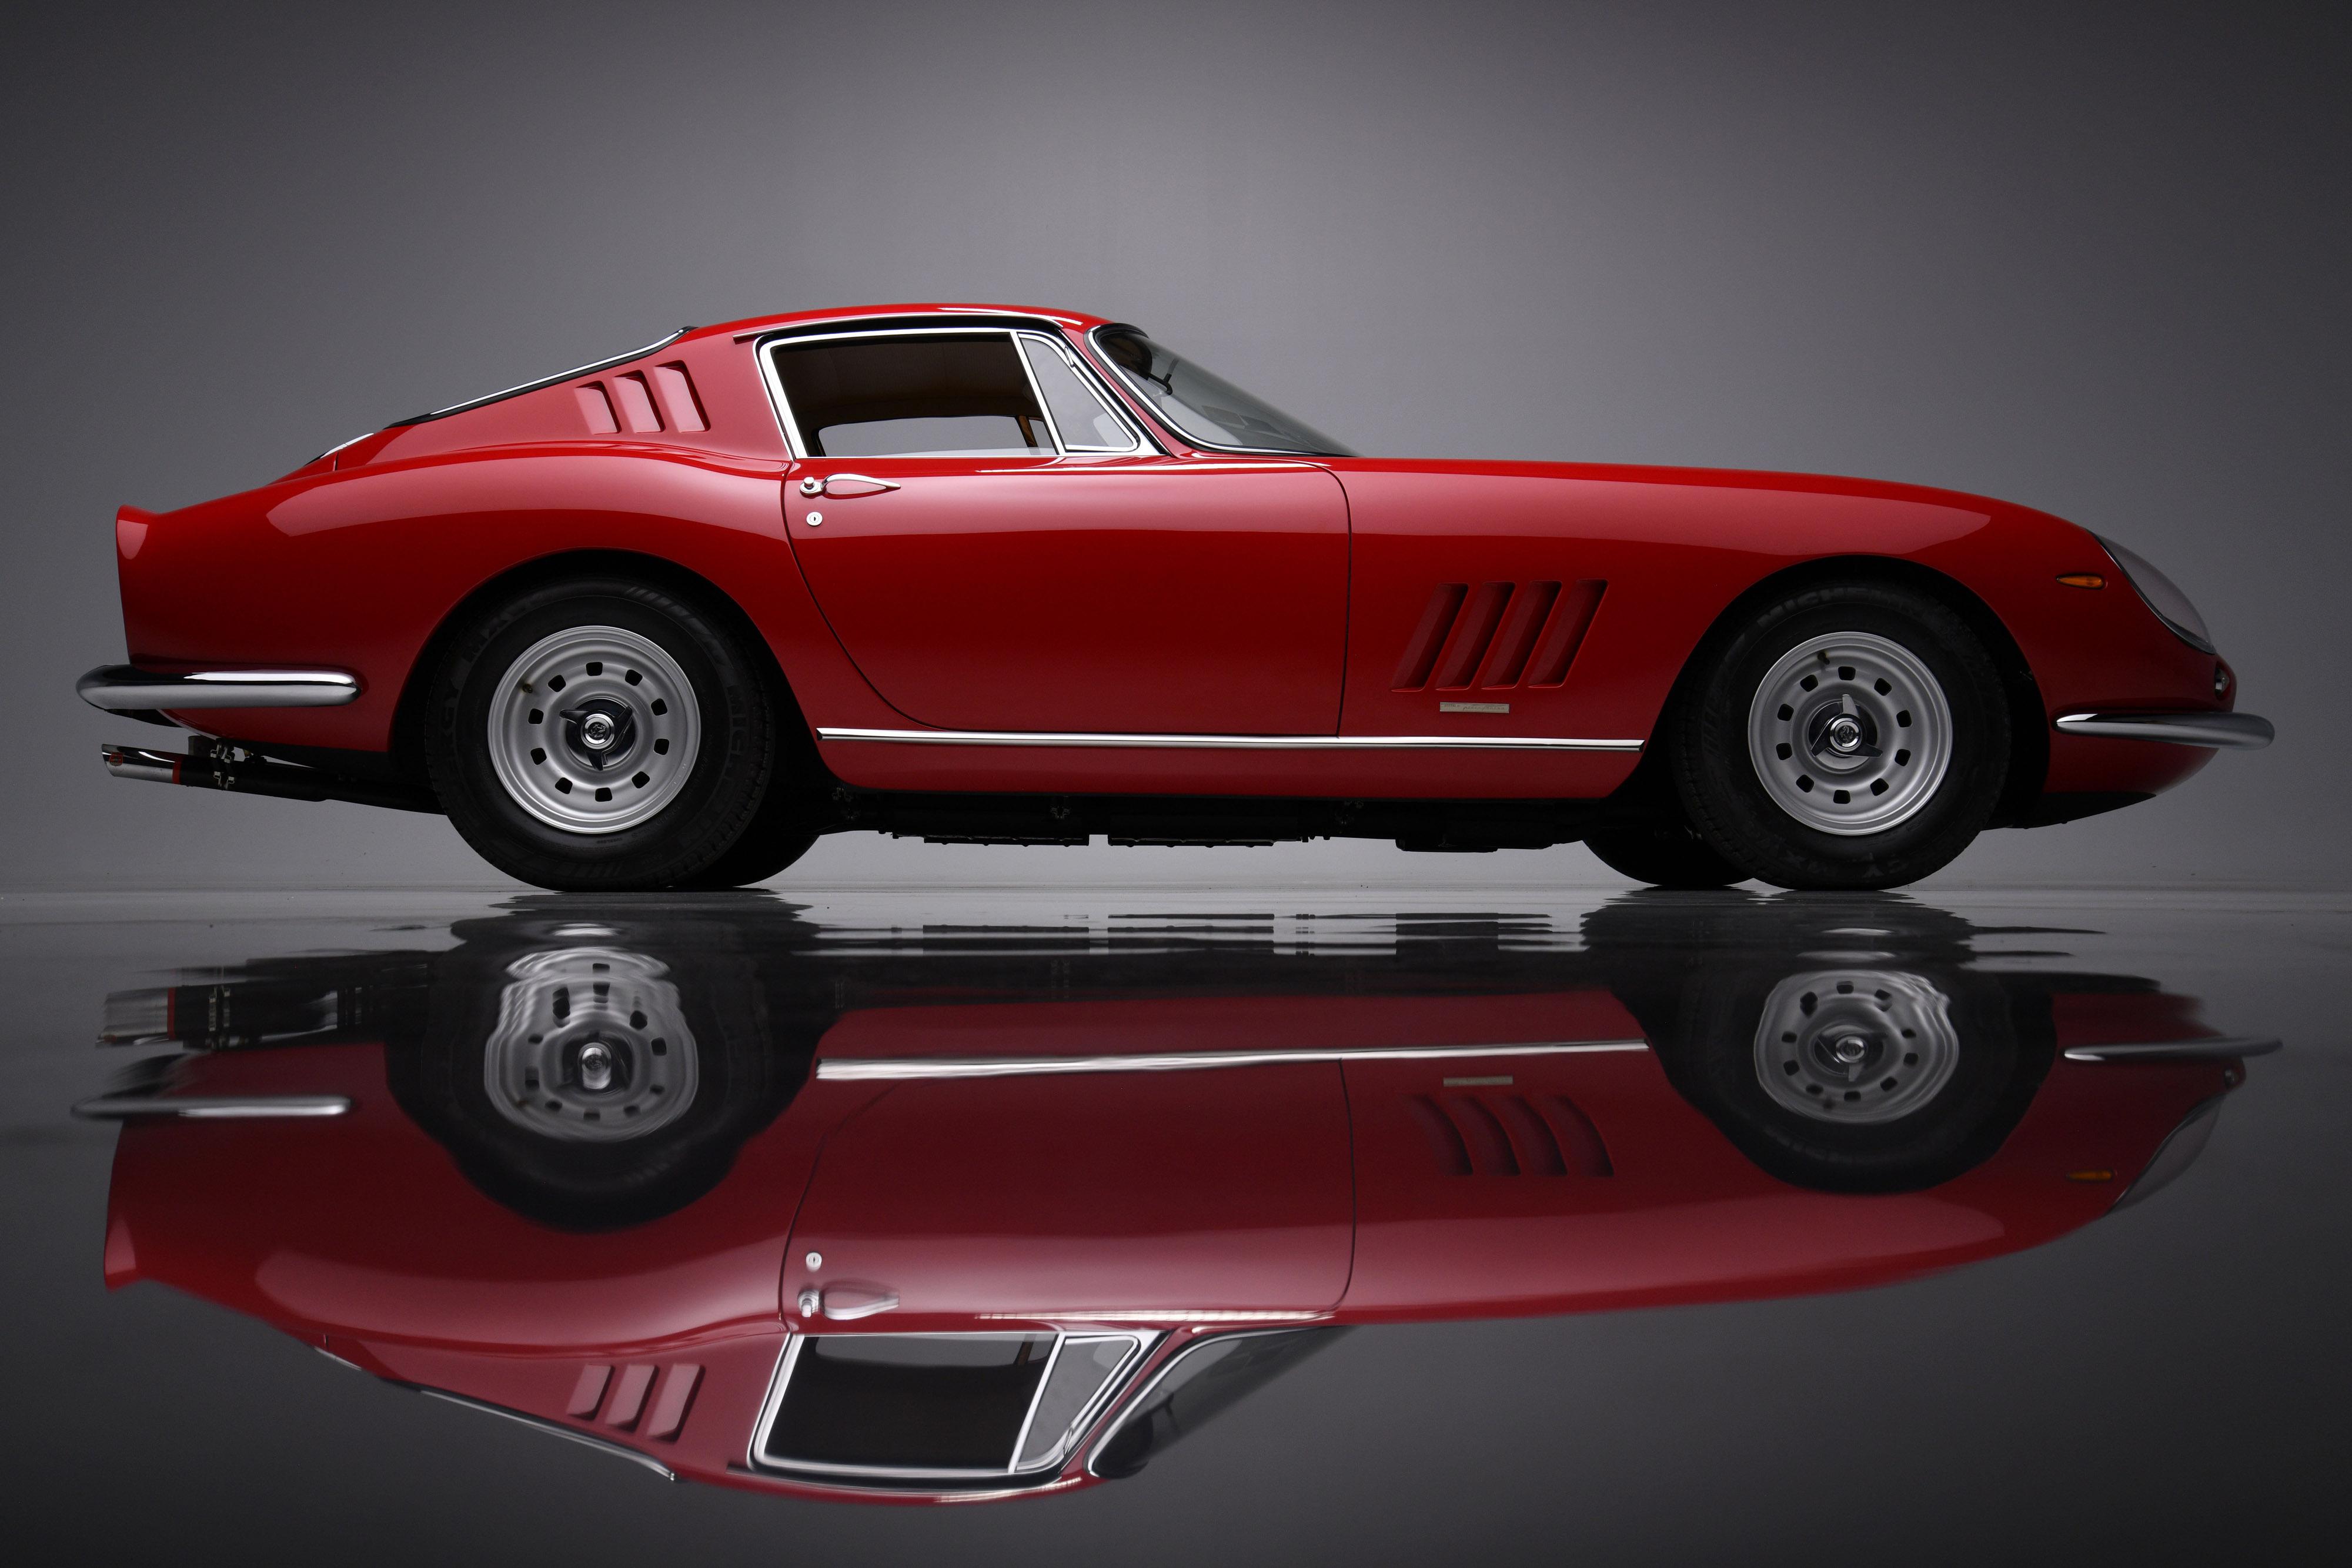 Award Winning Classic 1967 Ferrari 275 Gtb 4 To Cross Barrett Jackson Scottsdale Auction Block Business Wire